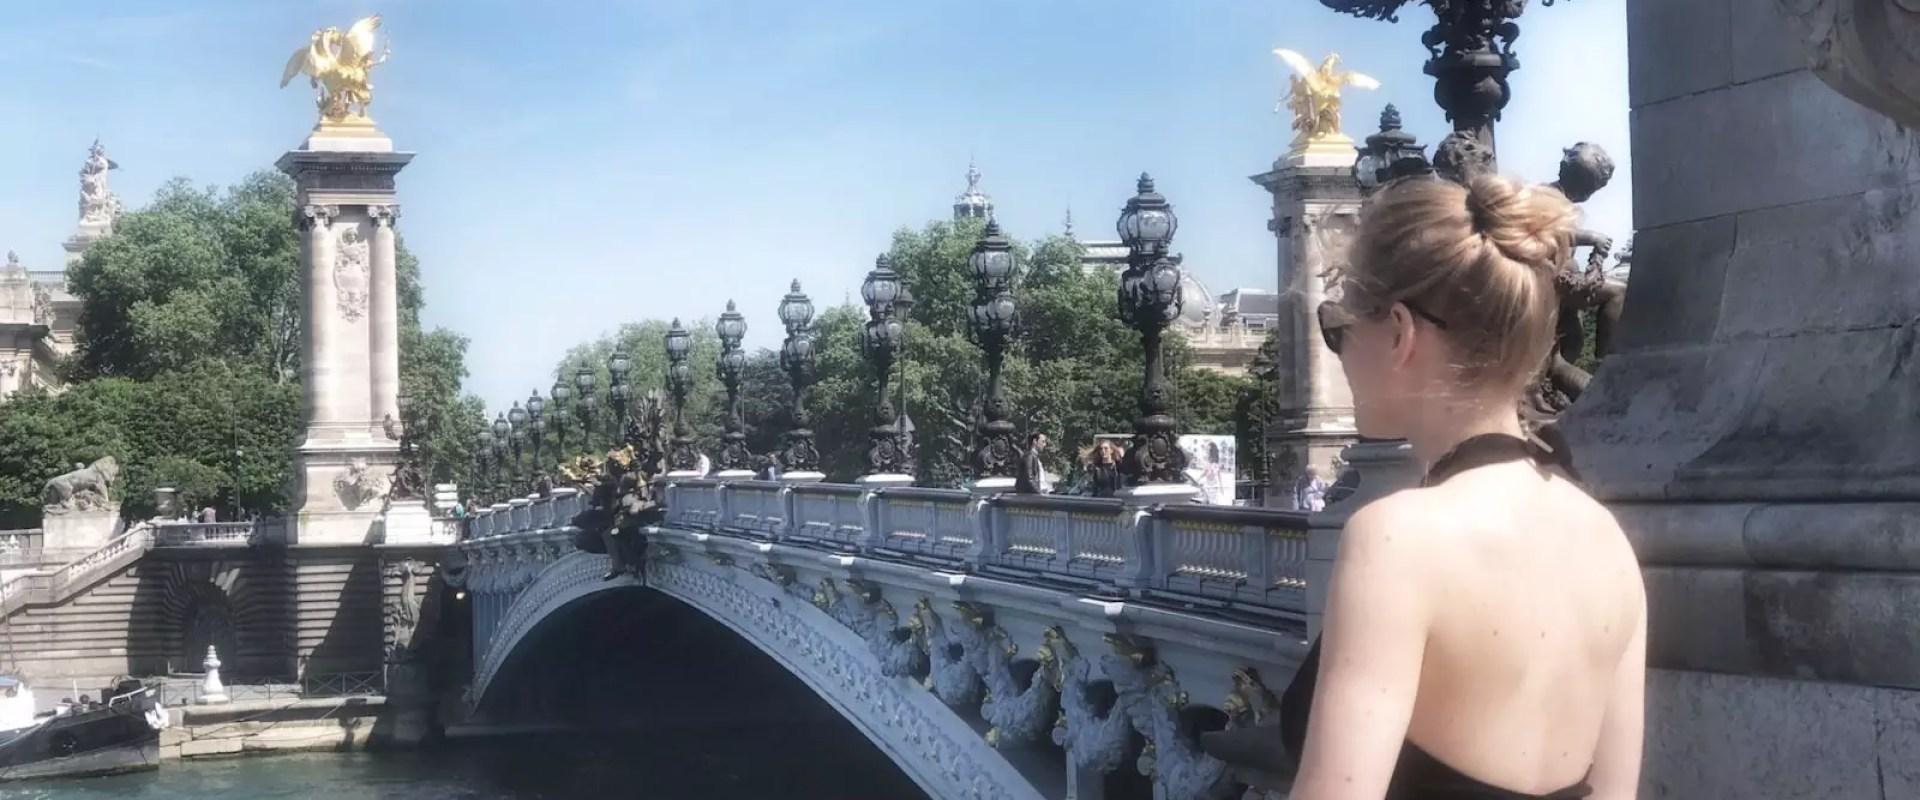 How to avoid touristic traps in paris